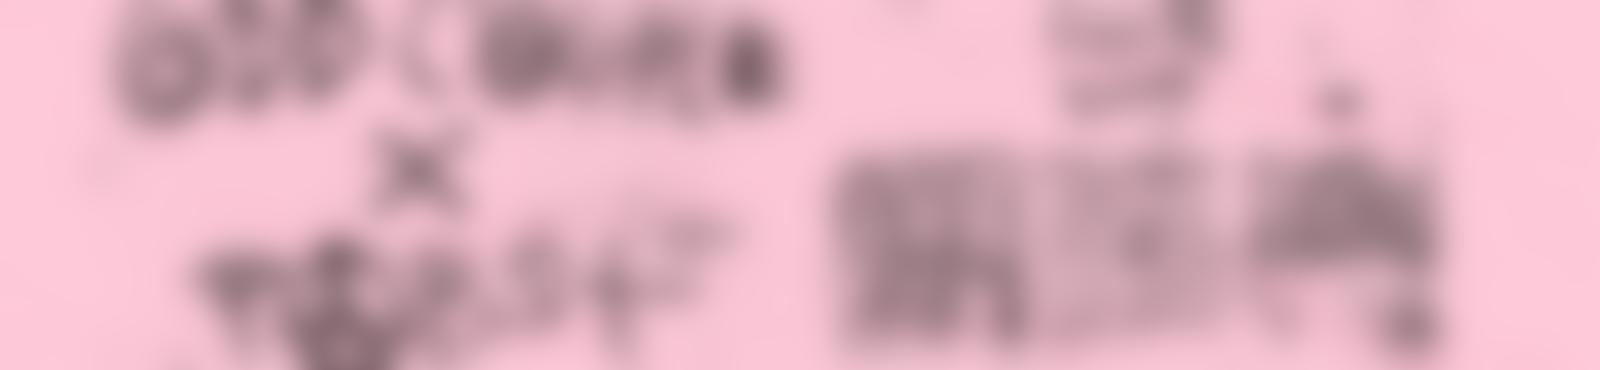 Blurred cd61482f 149b 4967 ad07 00ad97e49ba6